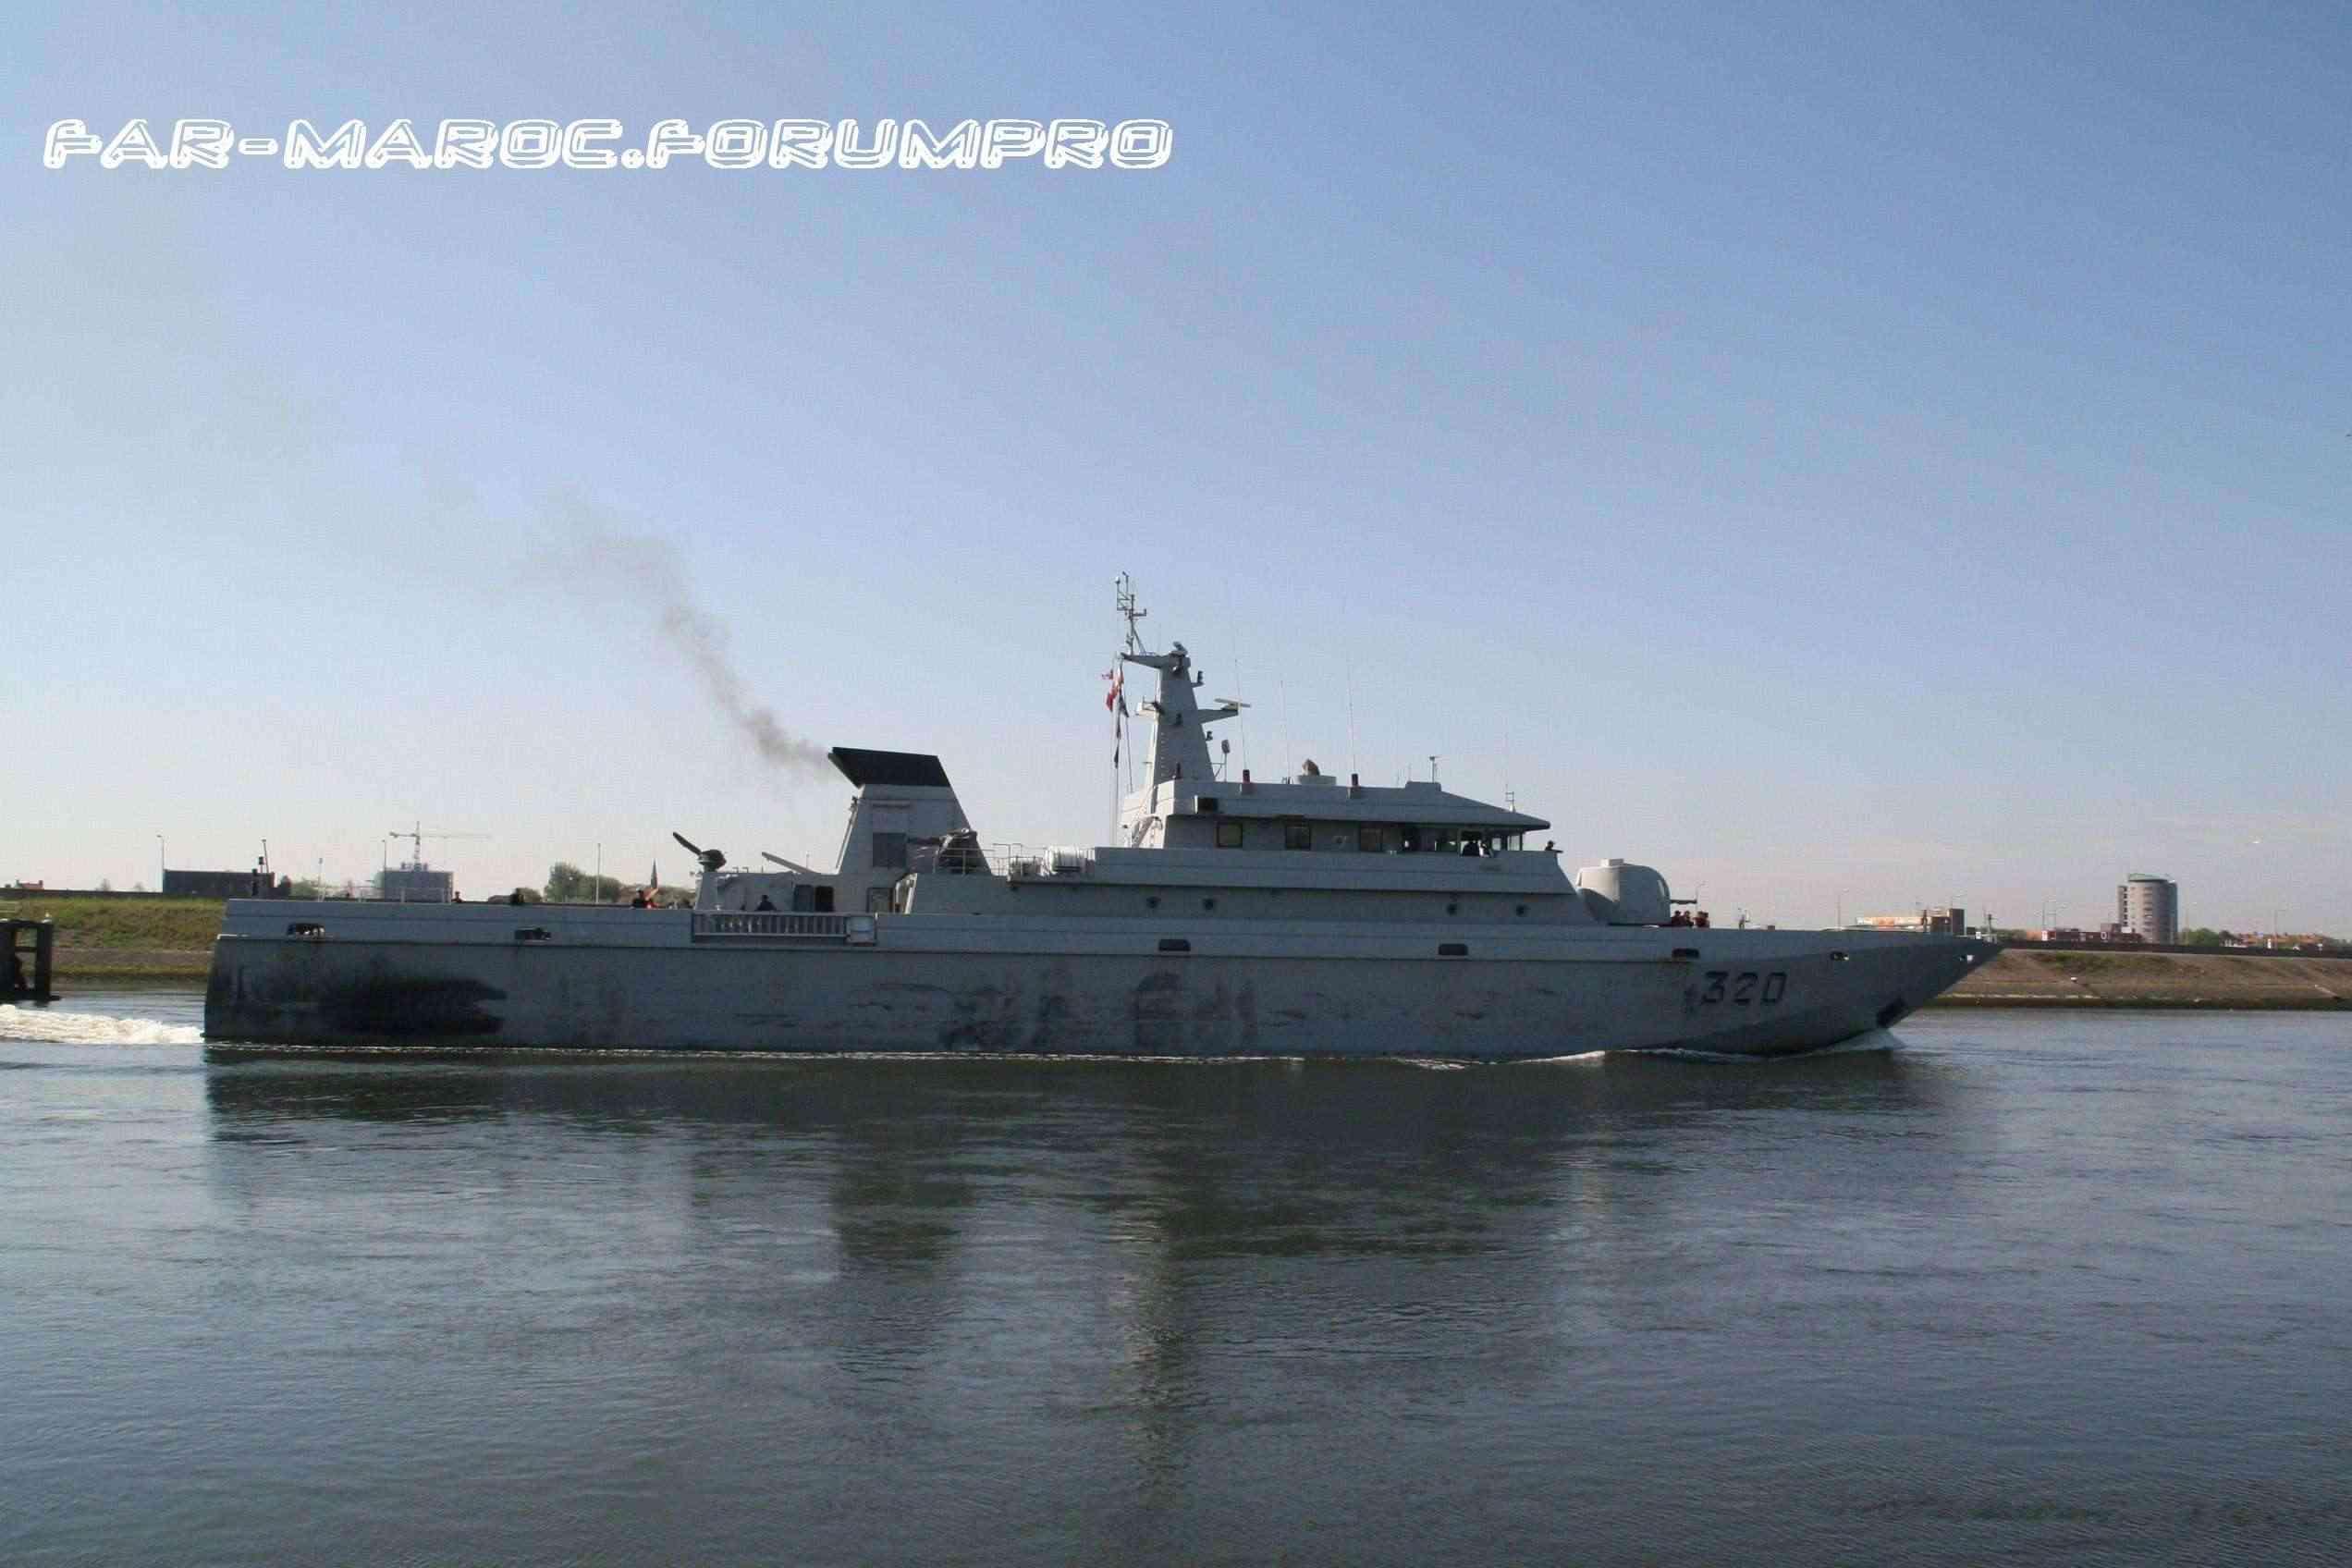 Royal Moroccan Navy Patrol Boats / Patrouilleurs de la Marine Marocaine - Page 2 Shipph13